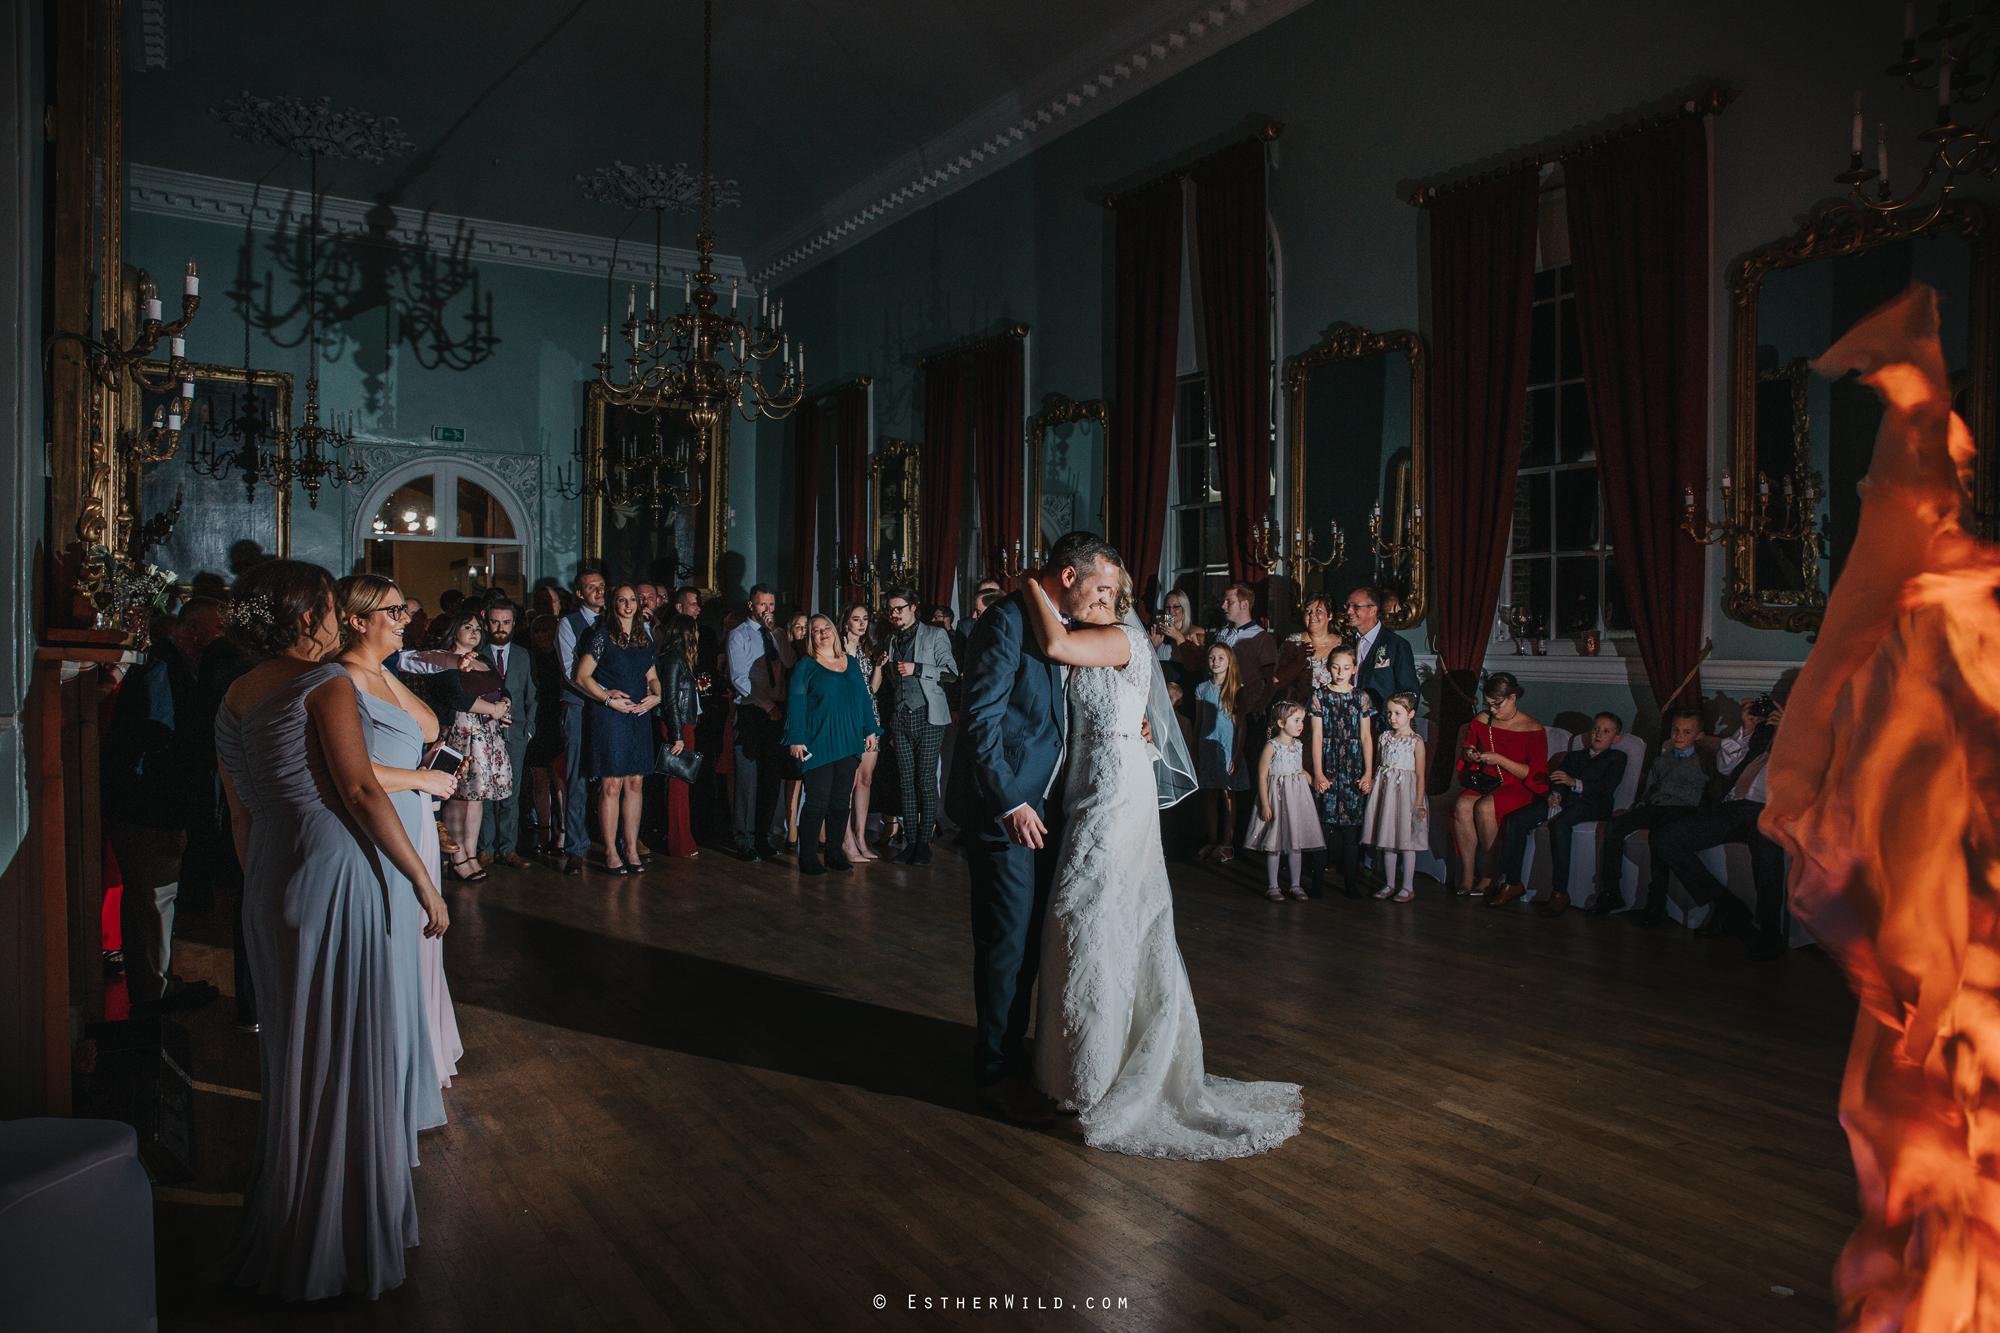 1117_Kings_Lynn_Town_Hall_Wedding_Esther_Wild_PhotographerIMGL0800.jpg